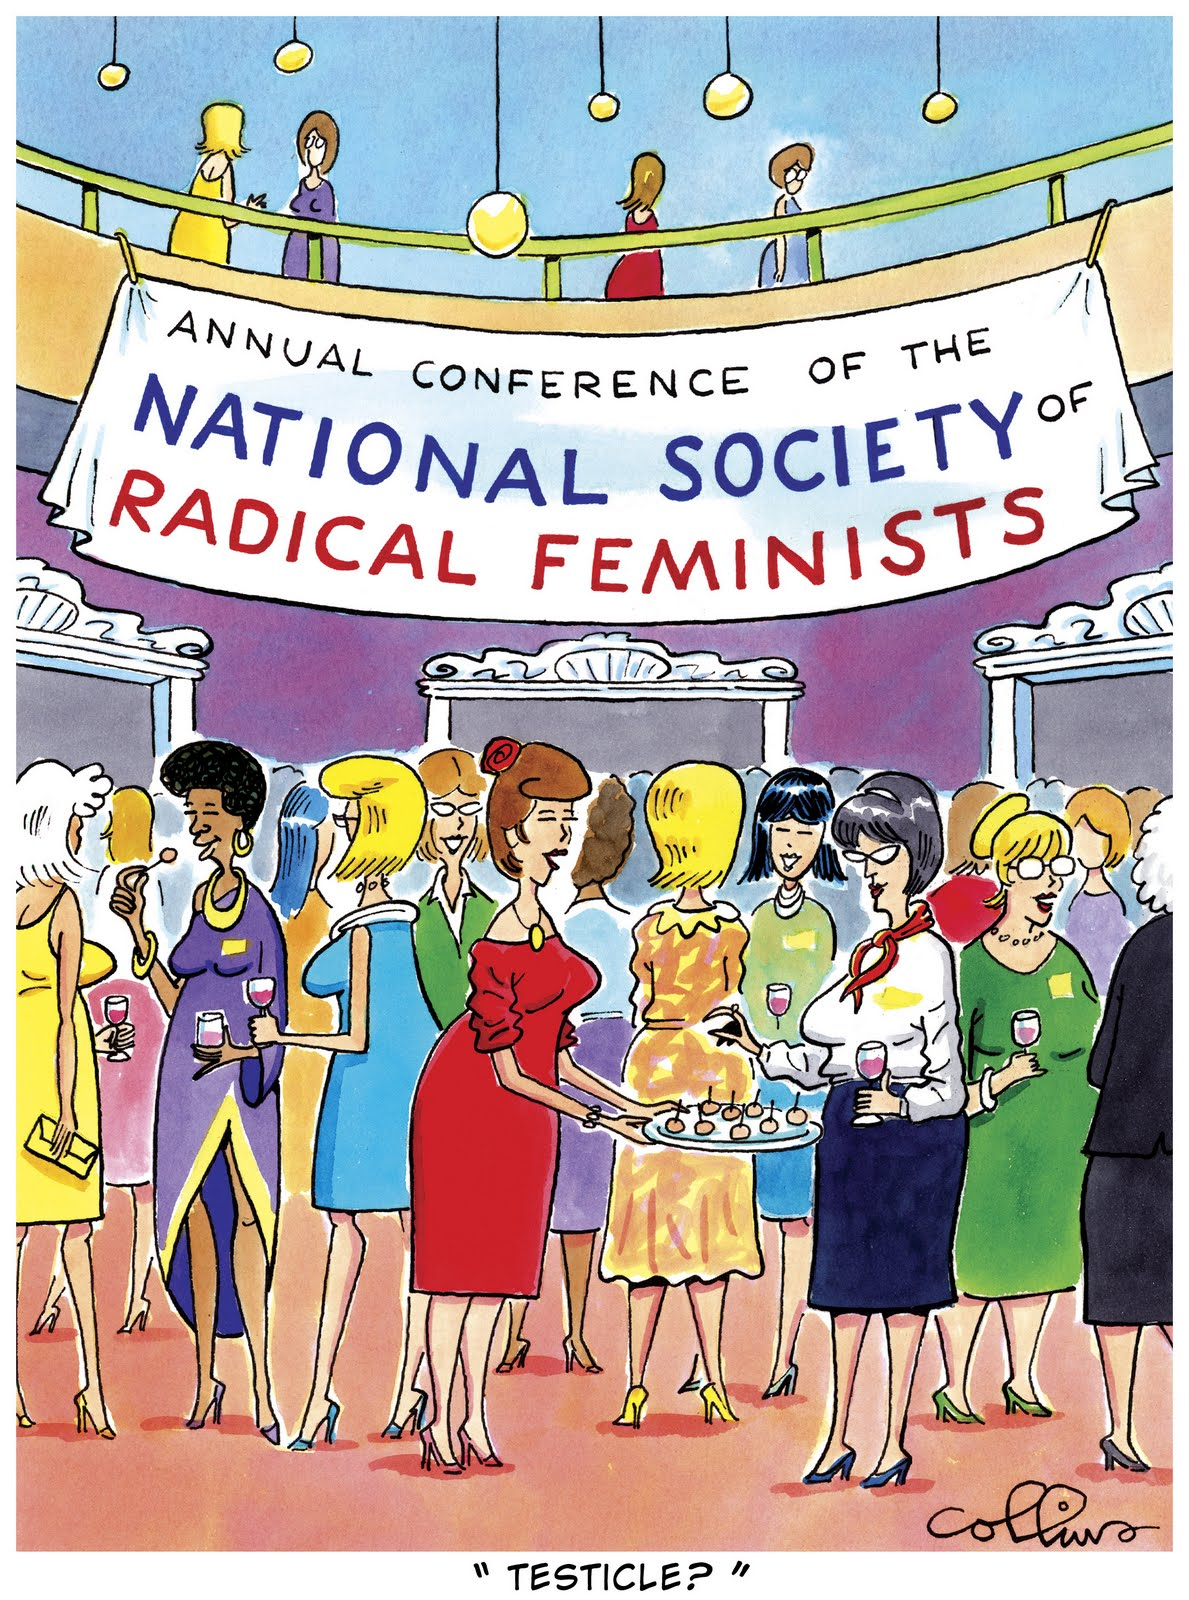 Remember radical feminists?